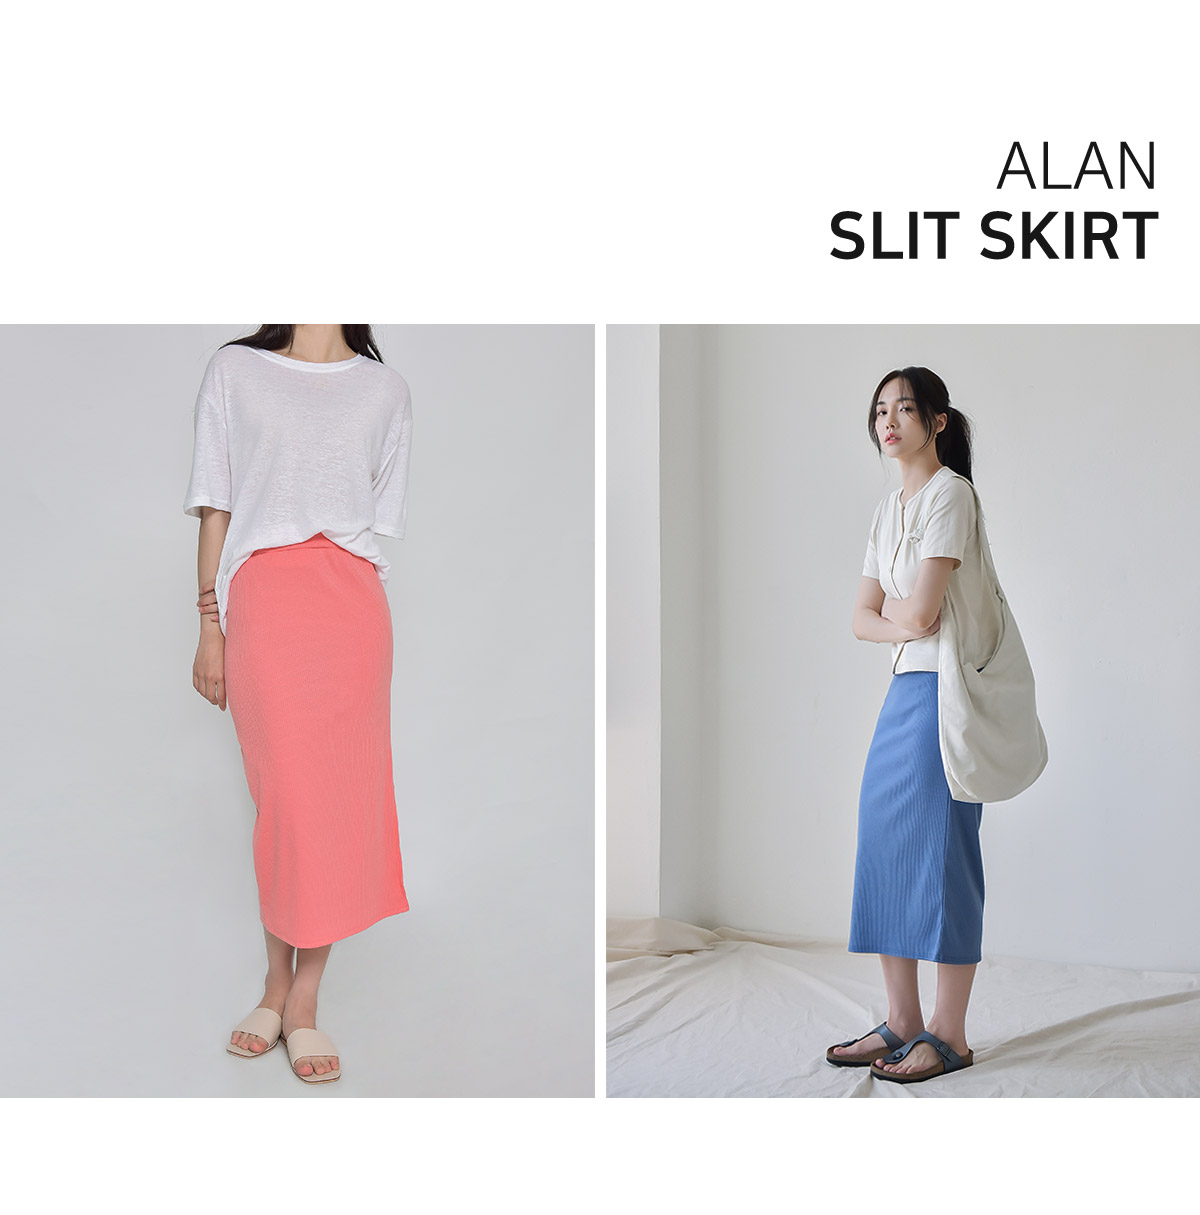 Alan Slit Skirt